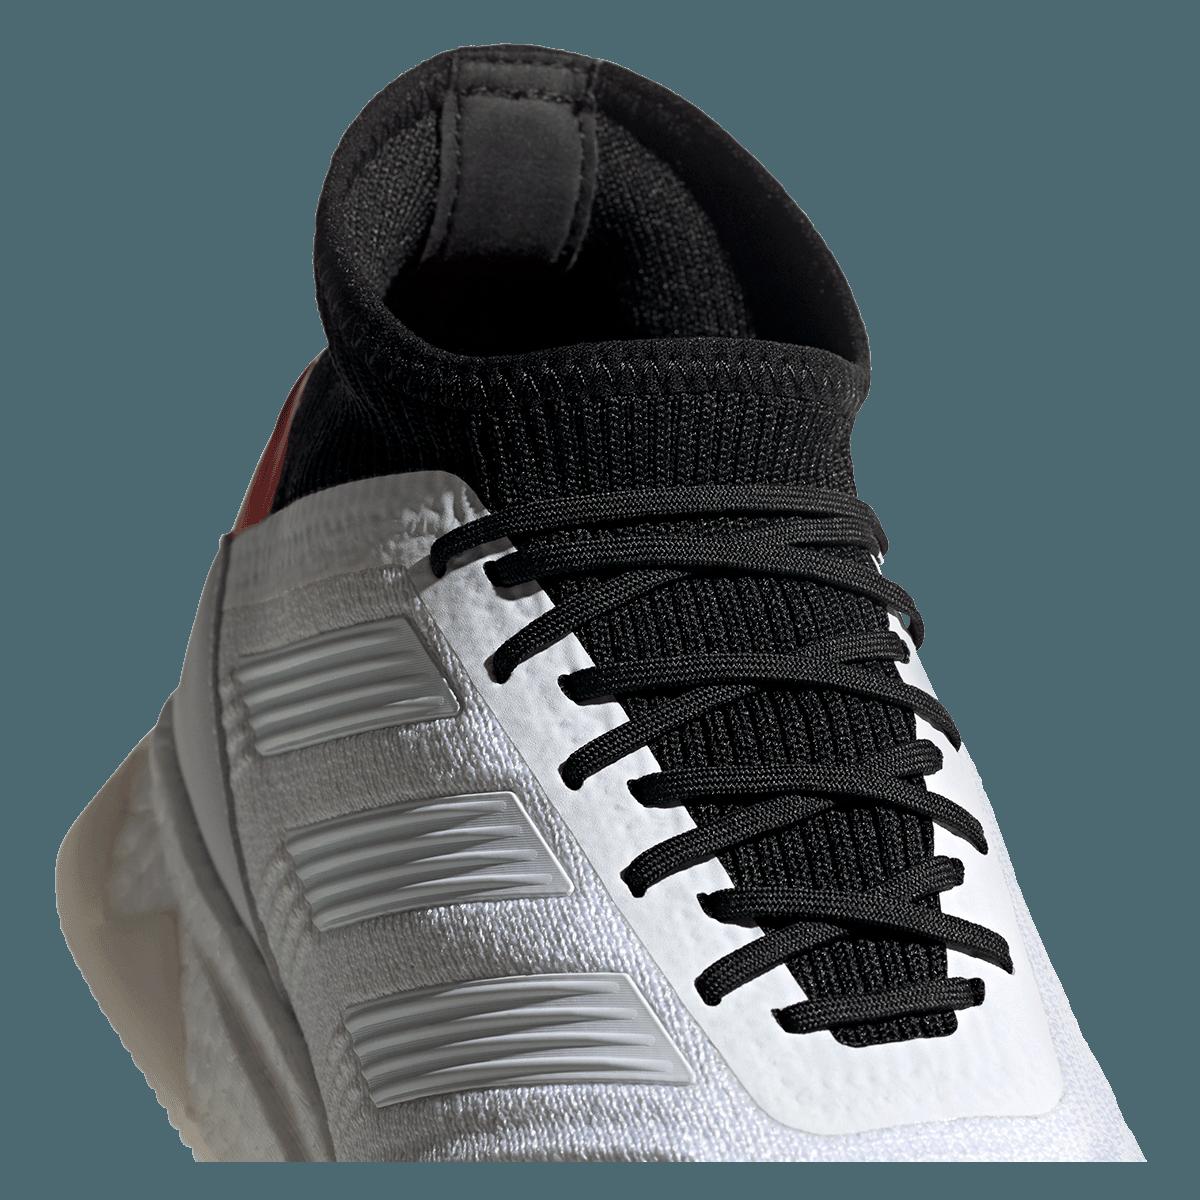 adidas voetbalschoenen Predator 19.1 witrood